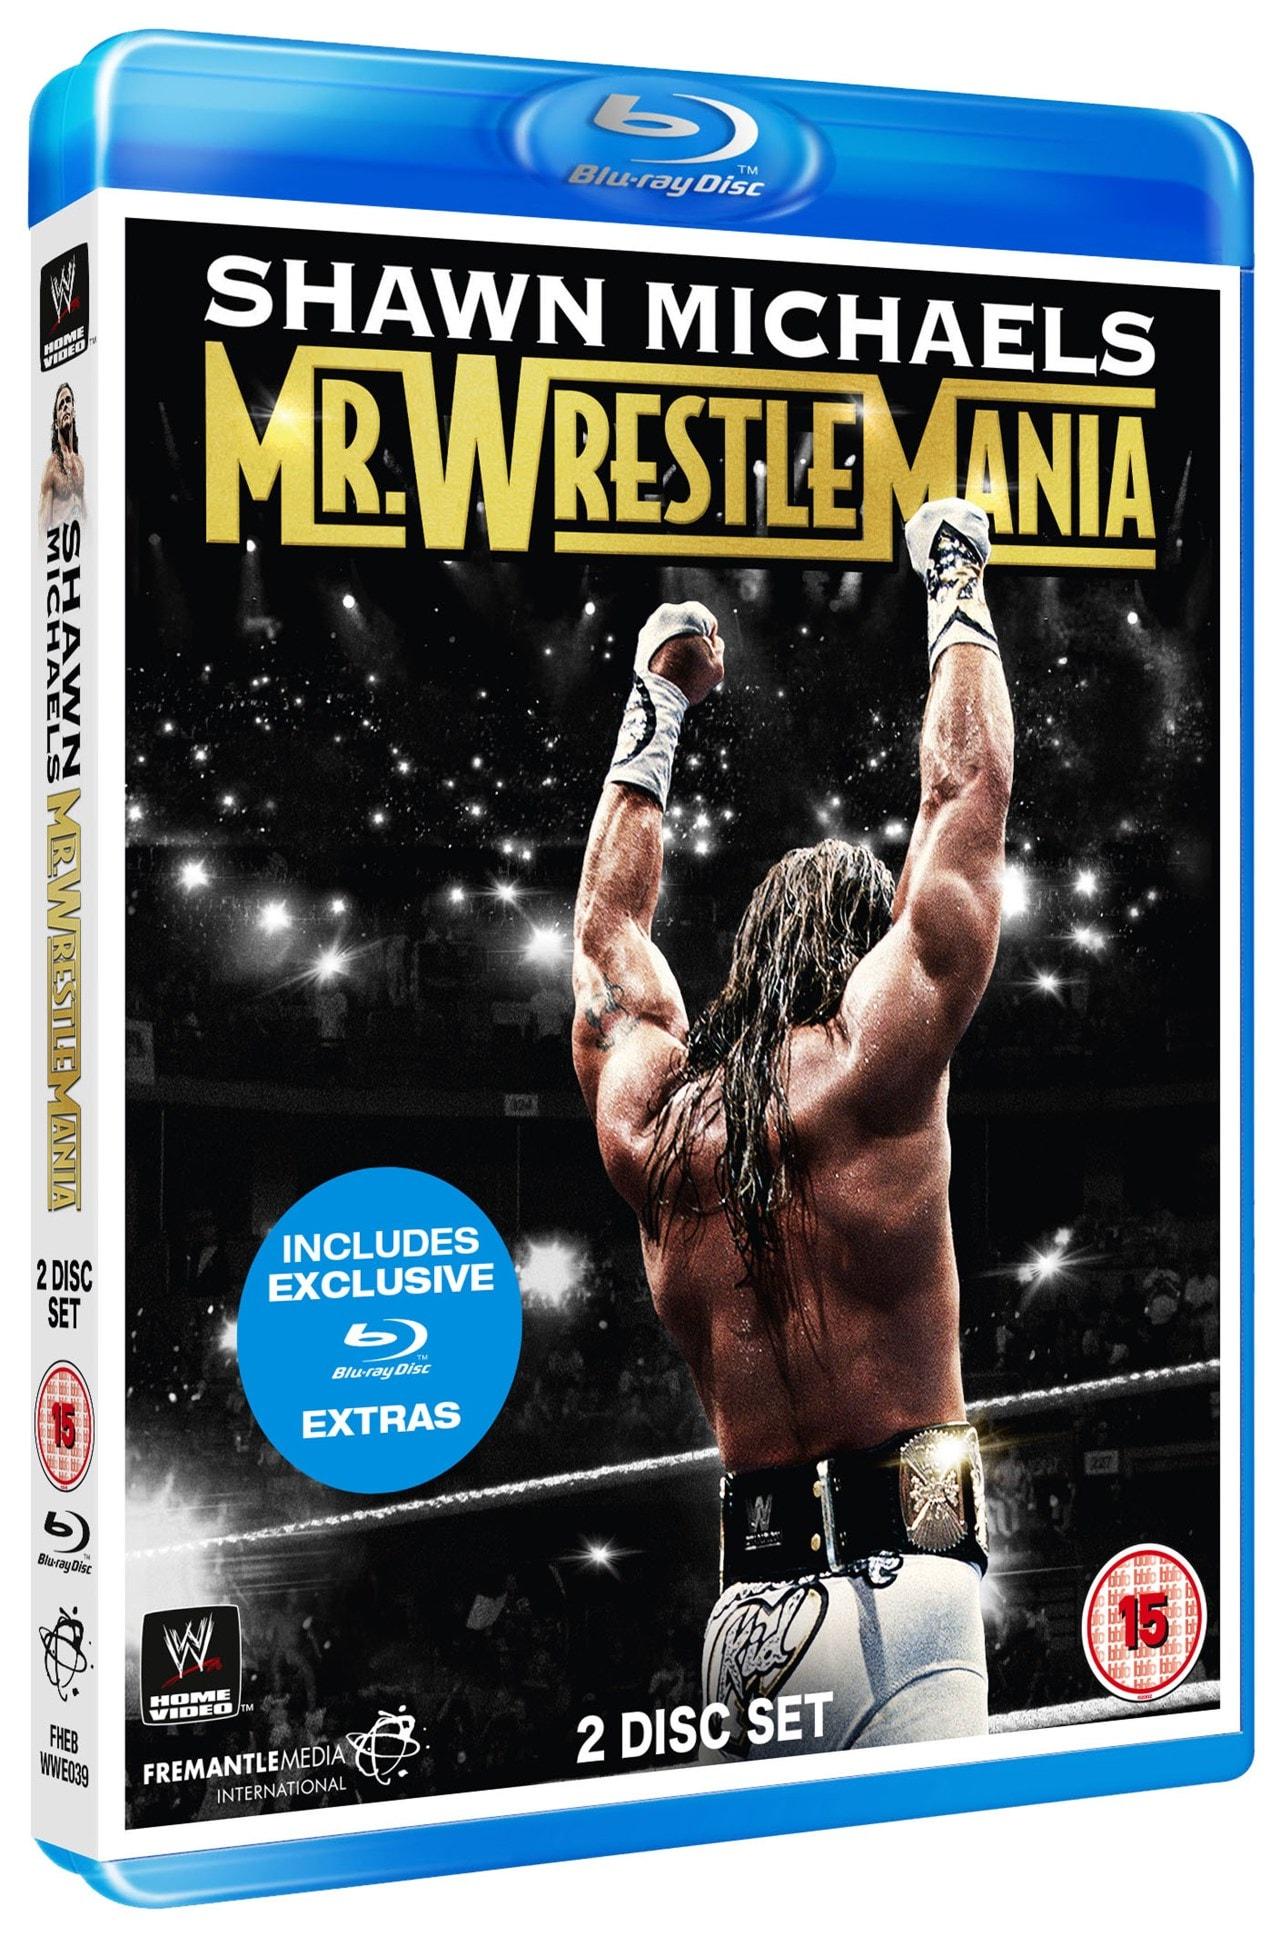 WWE: Shawn Michaels - Mr WrestleMania - 2